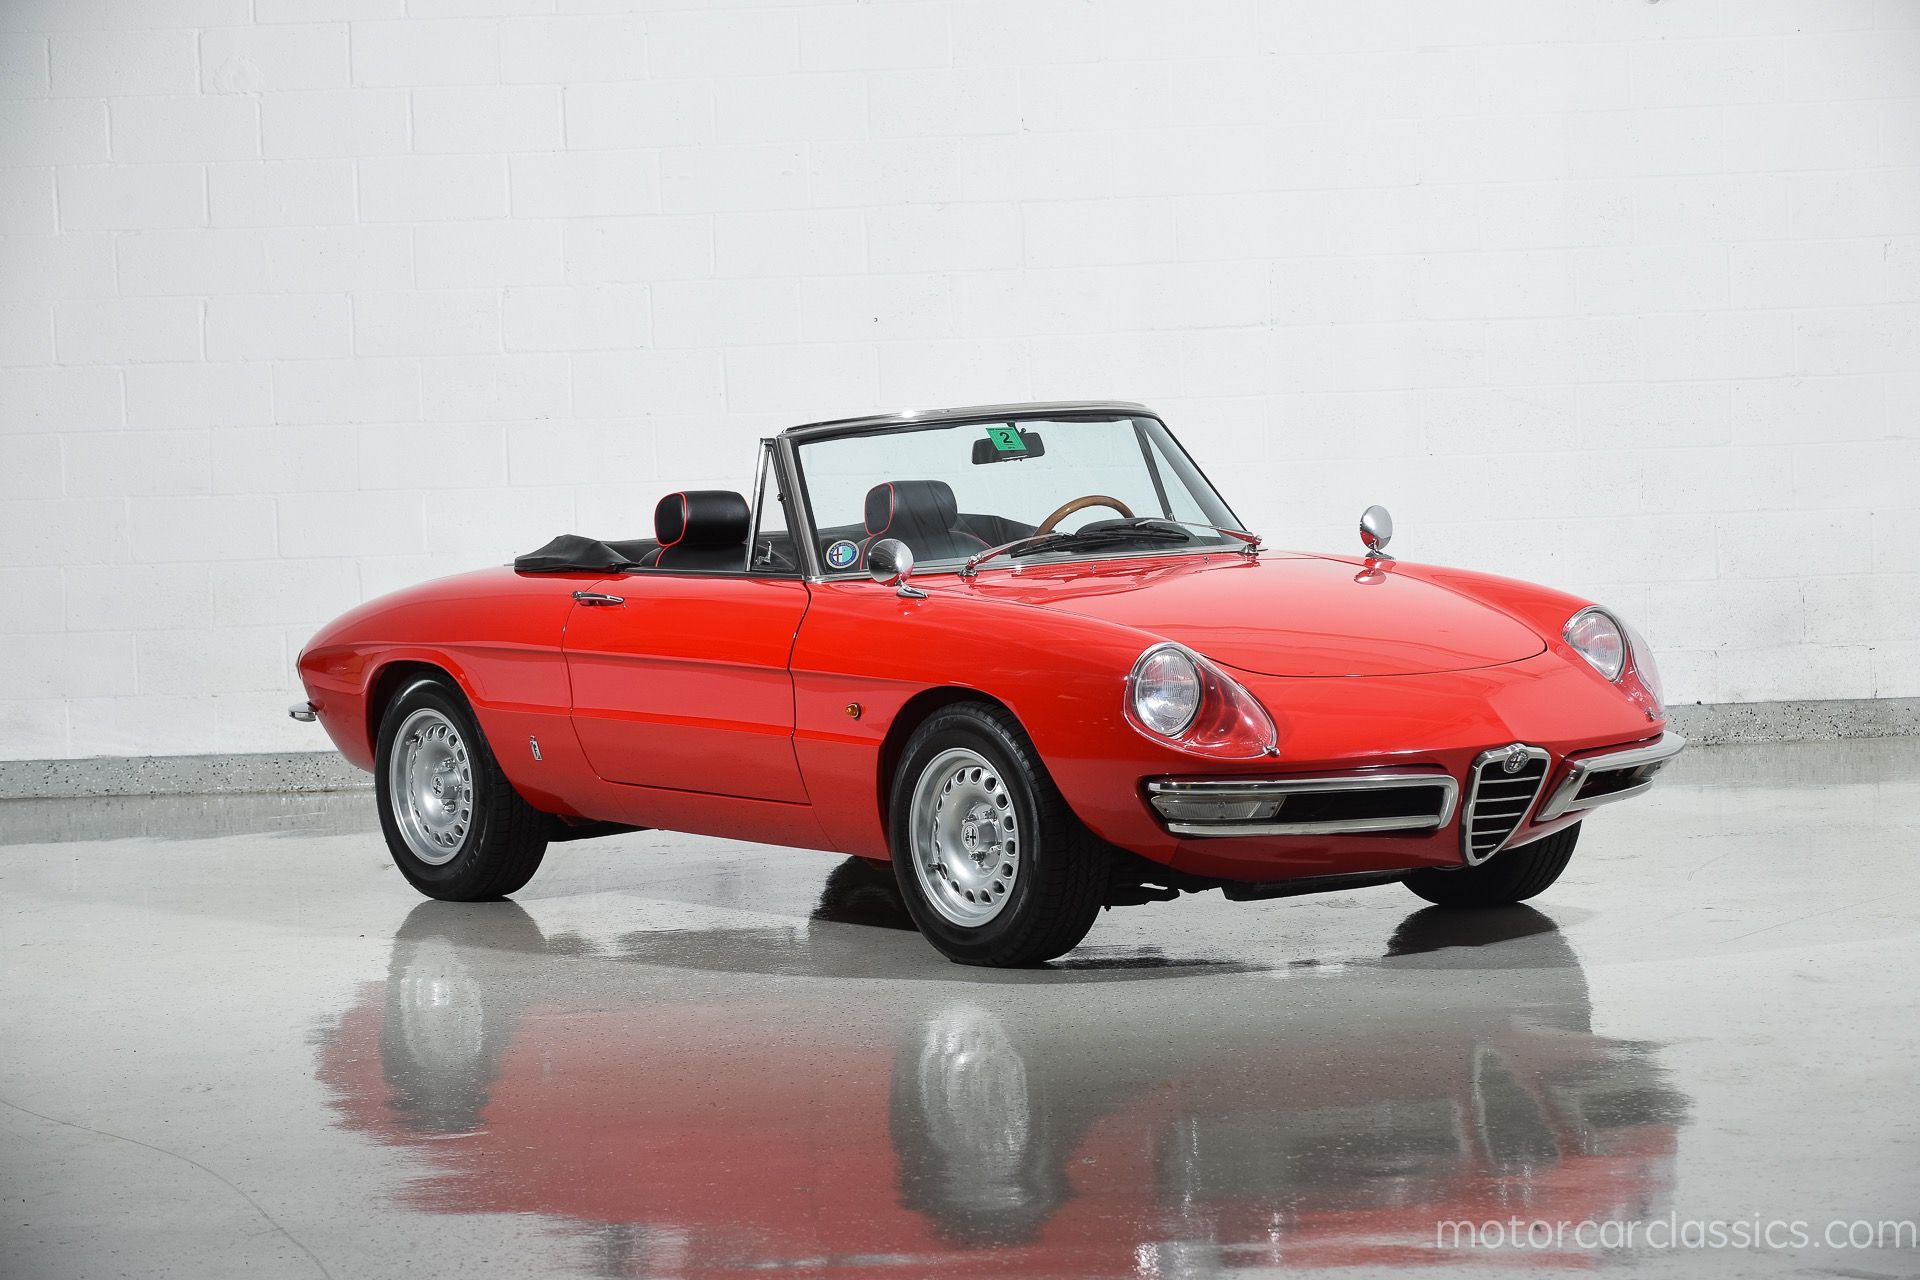 1967 Alfa Romeo Duetto   Motorcar Classics   Exotic and Classic Car ...